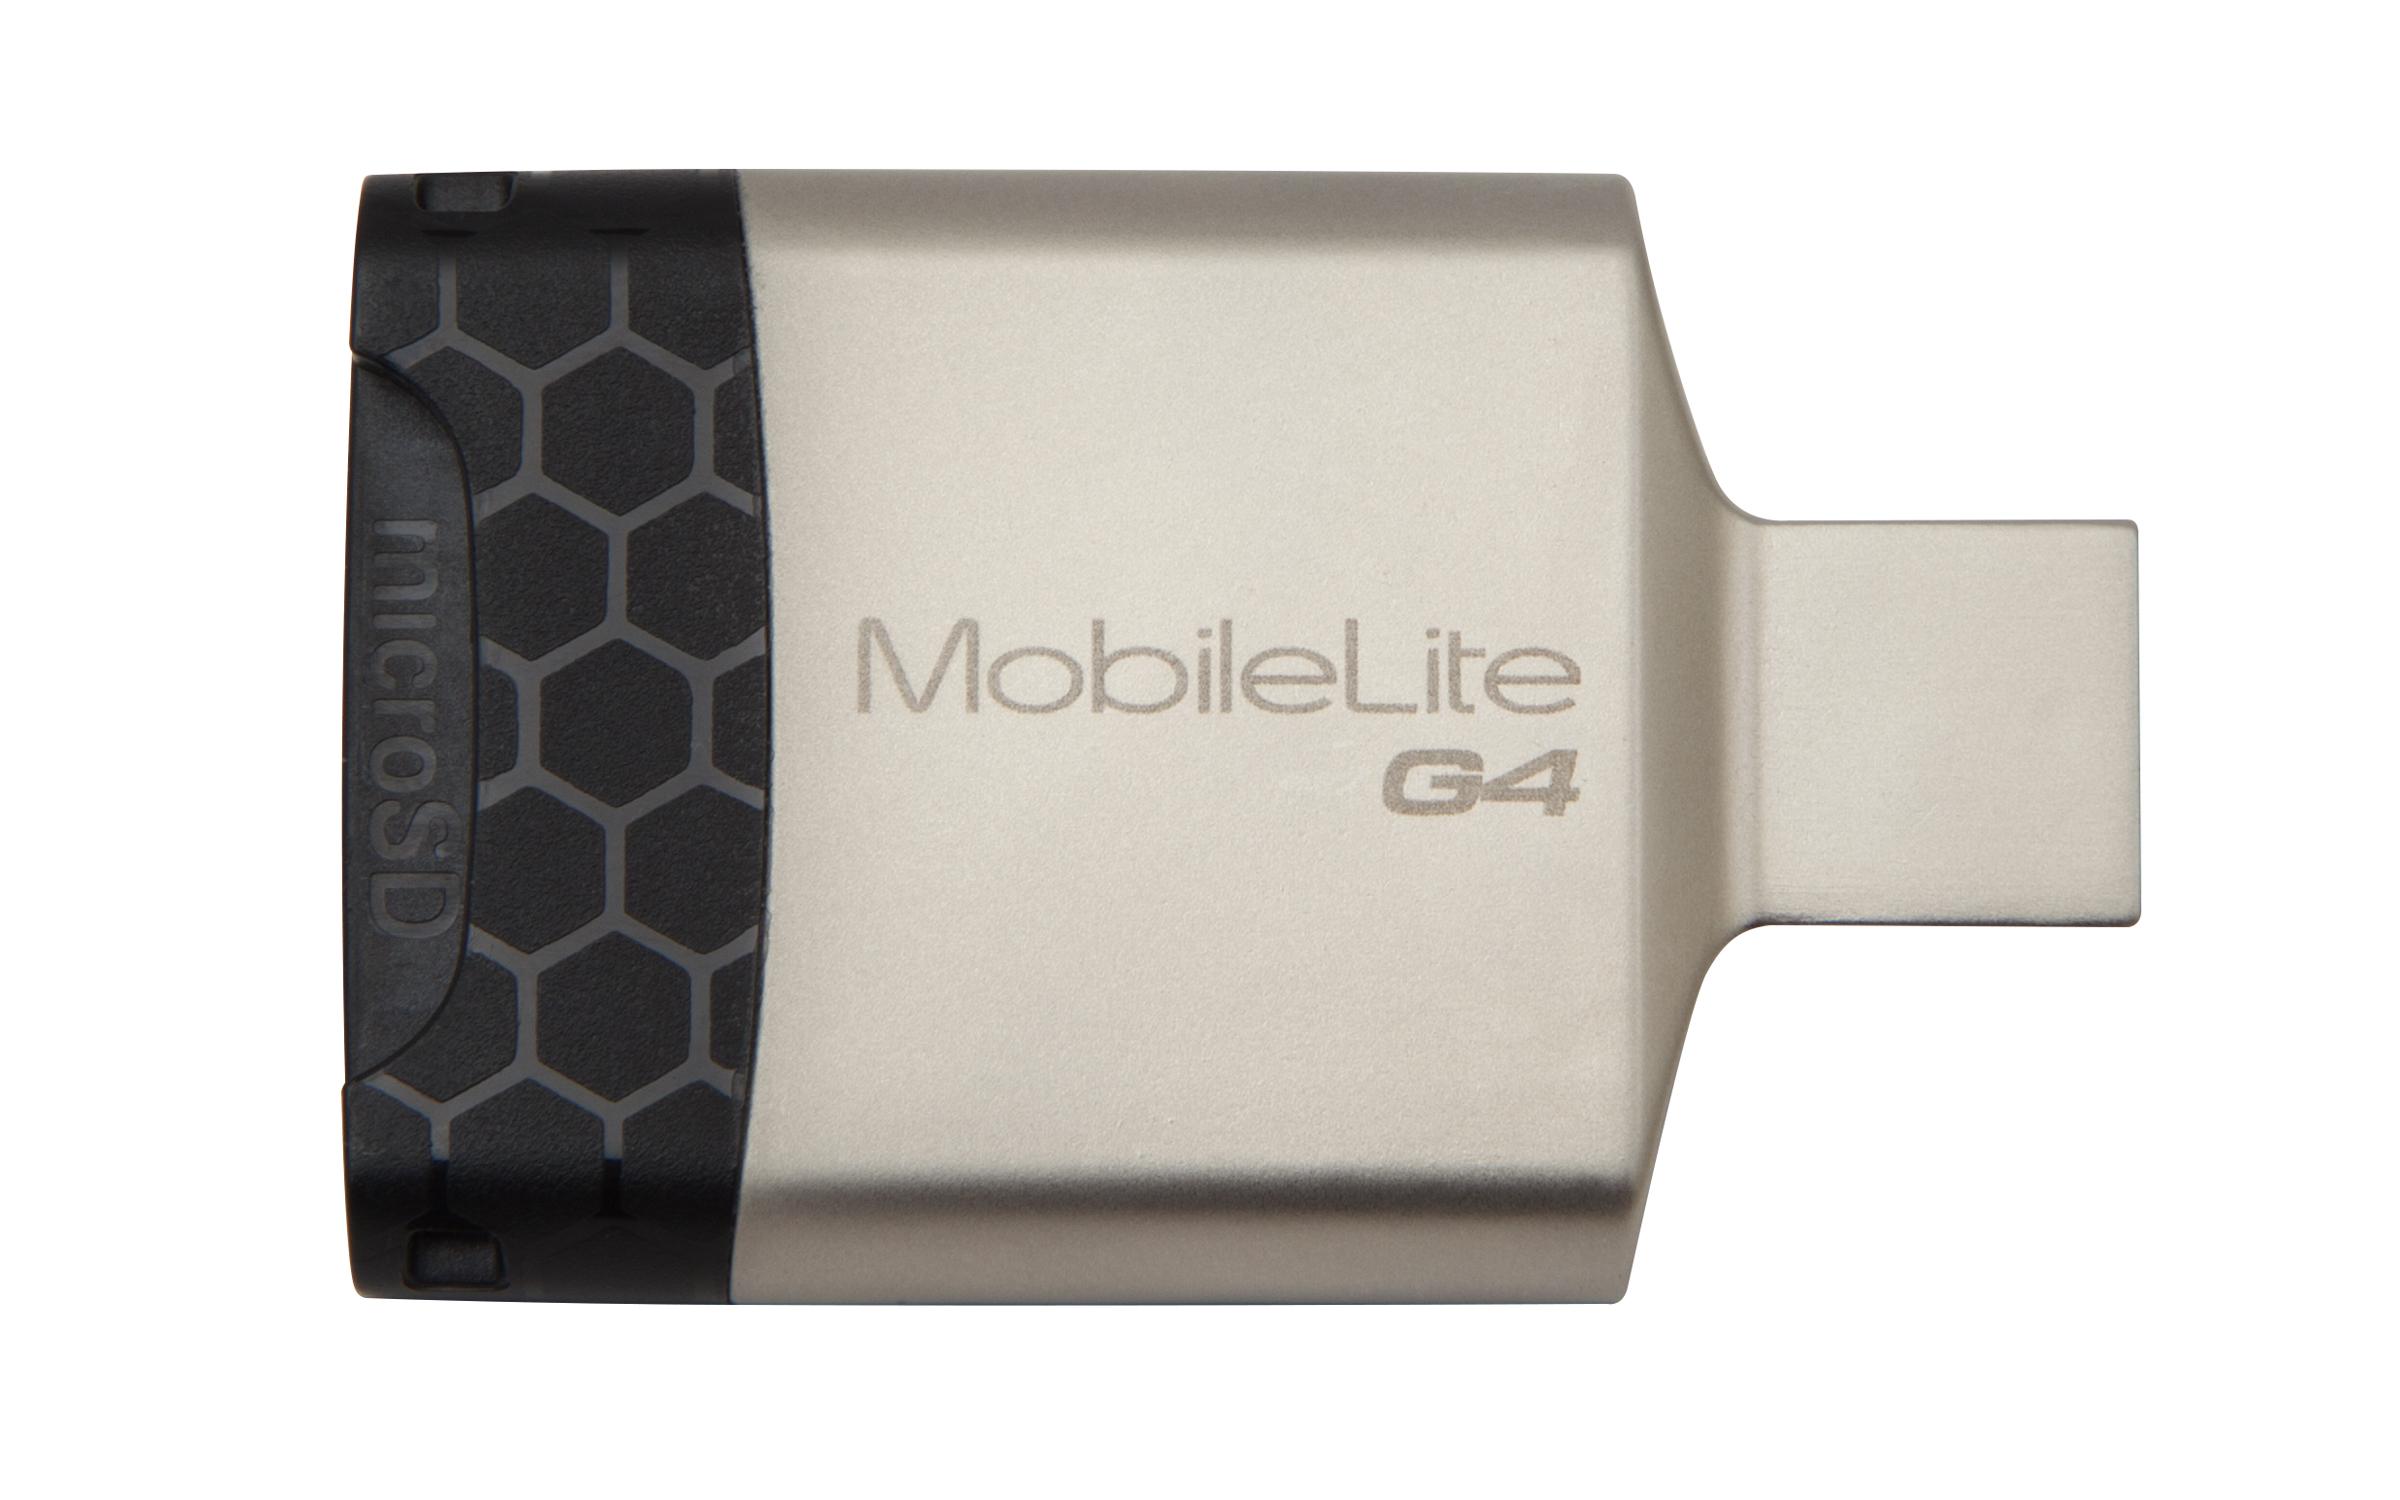 MobileLite G4 USB 3.0 čtečka karet Kingston